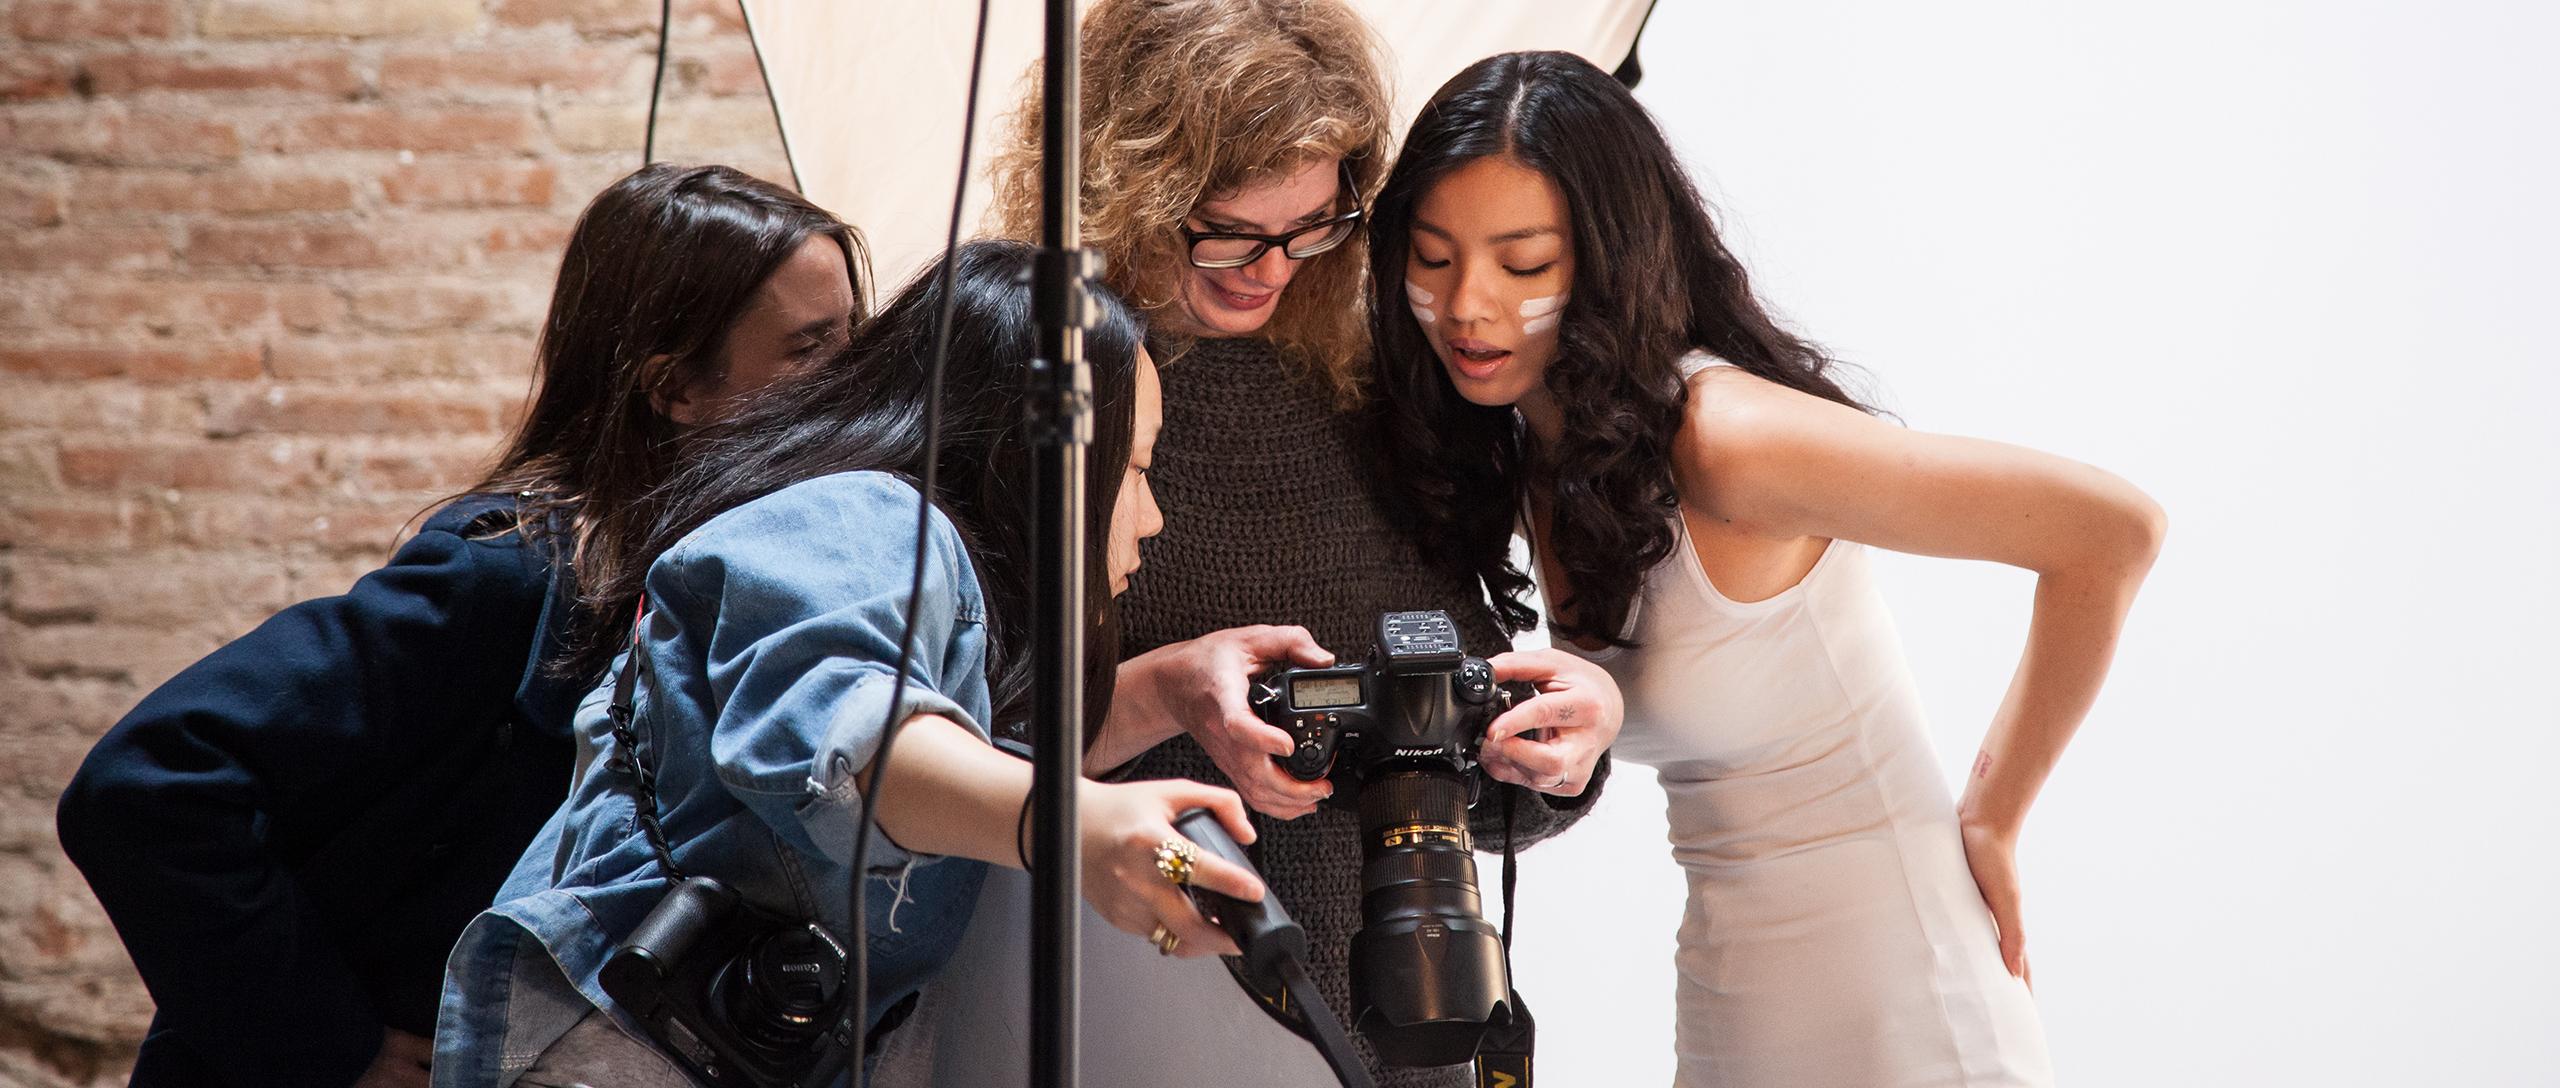 Katherin Wermke con alumnas en Barcelona Photographer Studio